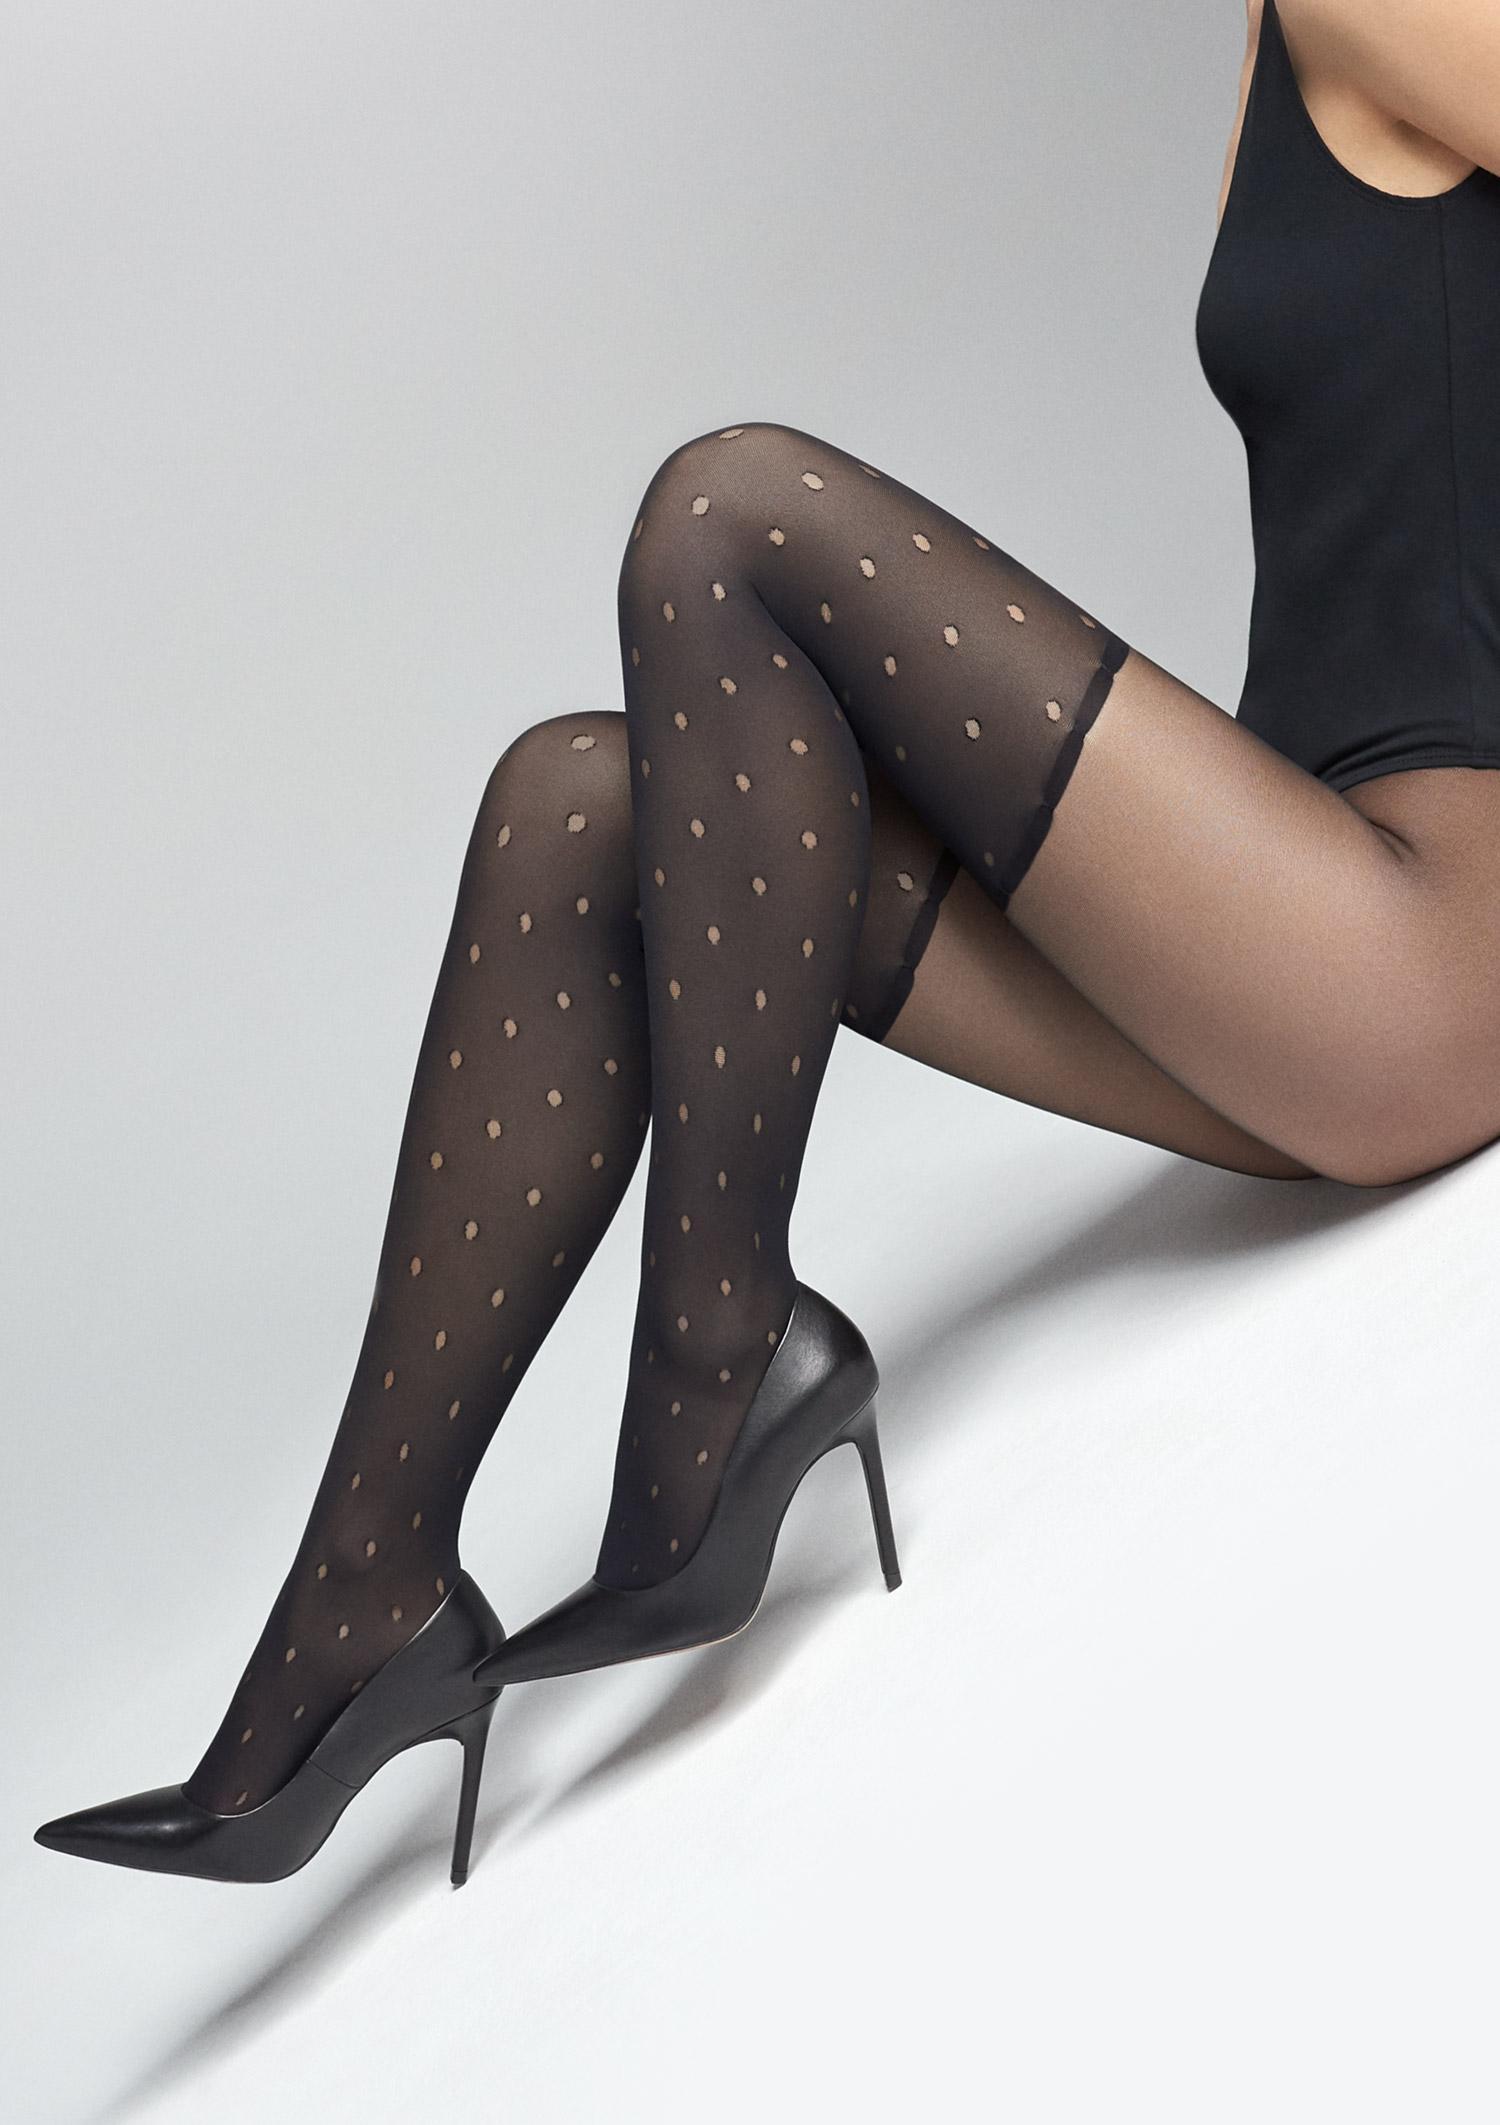 https://golden-legs.com.ua/images/stories/virtuemart/product/rajstopy-w-kropki-imitujace-ponczochy-zazu-s04_4.jpg